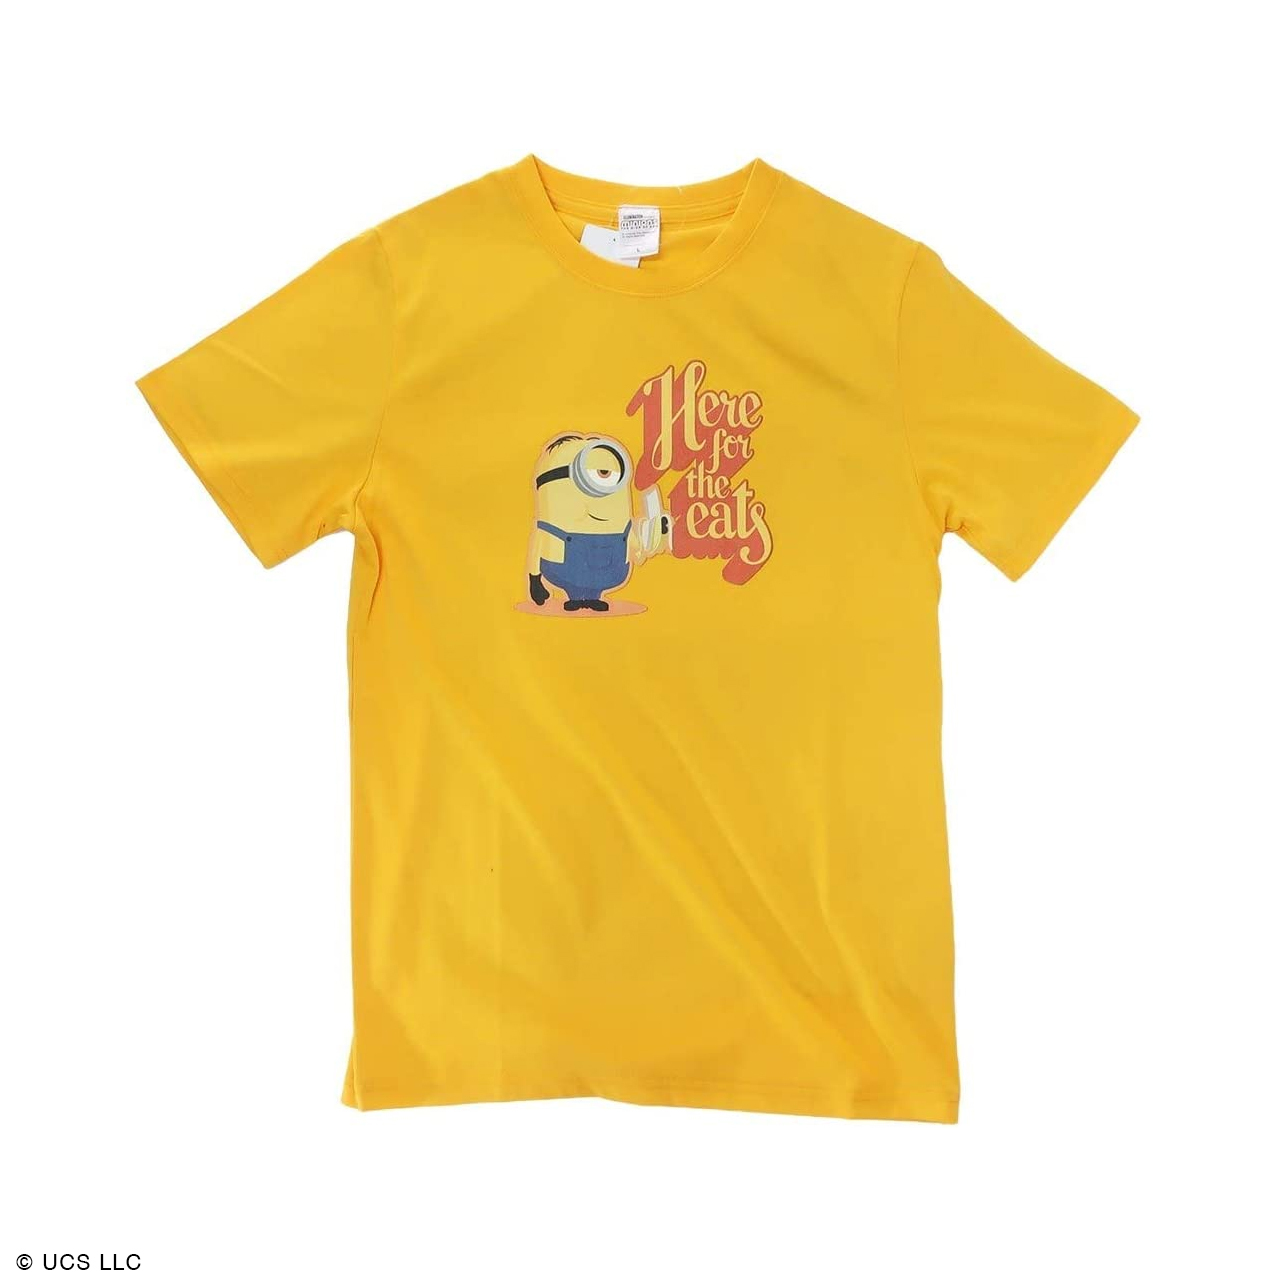 Tシャツ/ミニオン(映画『ミニオンズ フィーバー』 スチュアート)